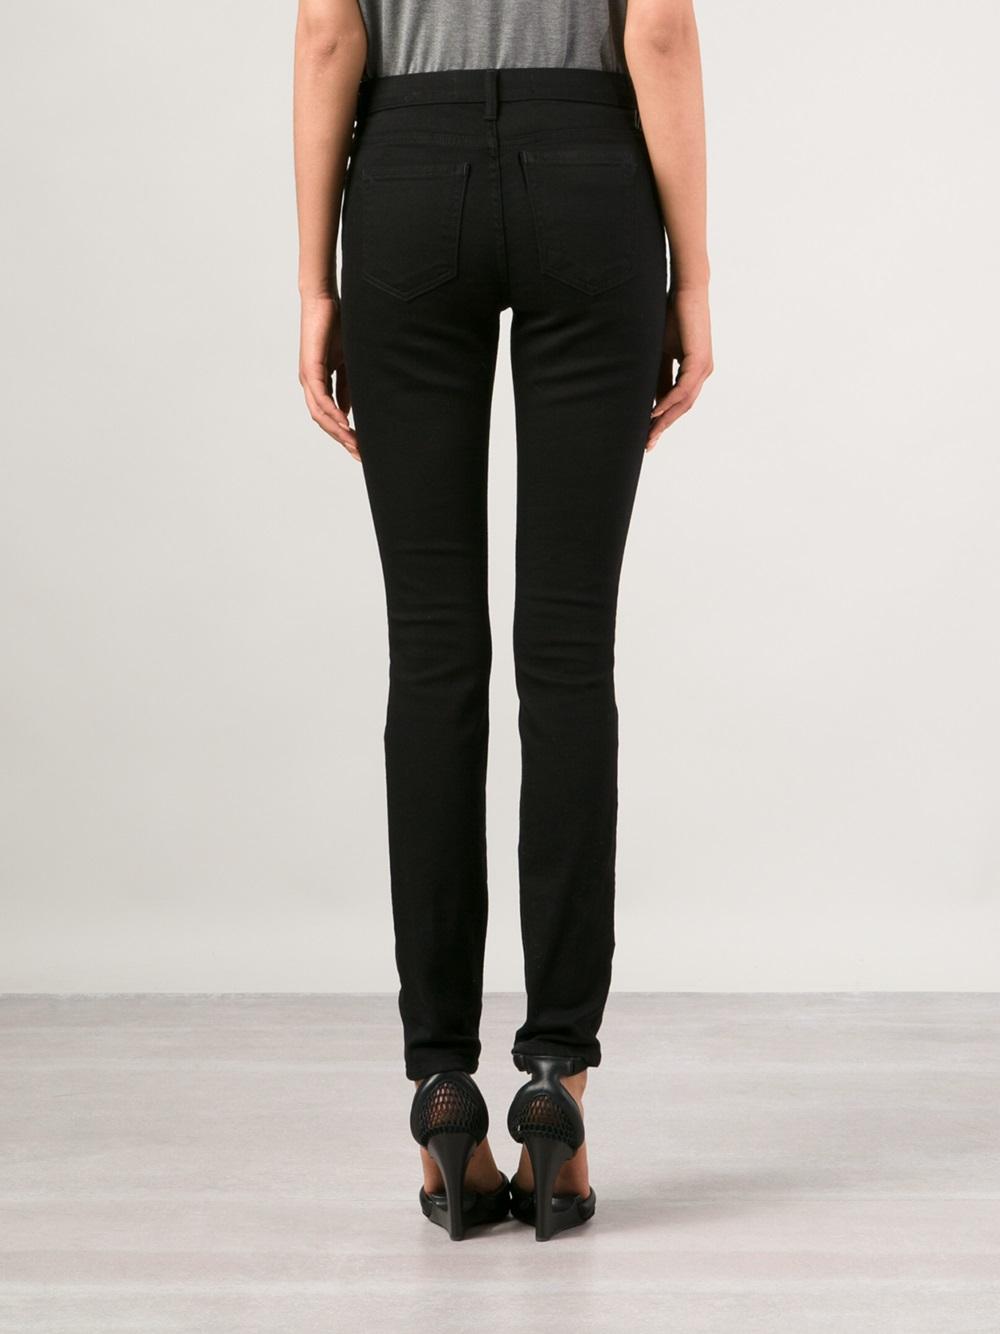 T by alexander wang Wang 001 Stay Skinny Jeans in Black | Lyst